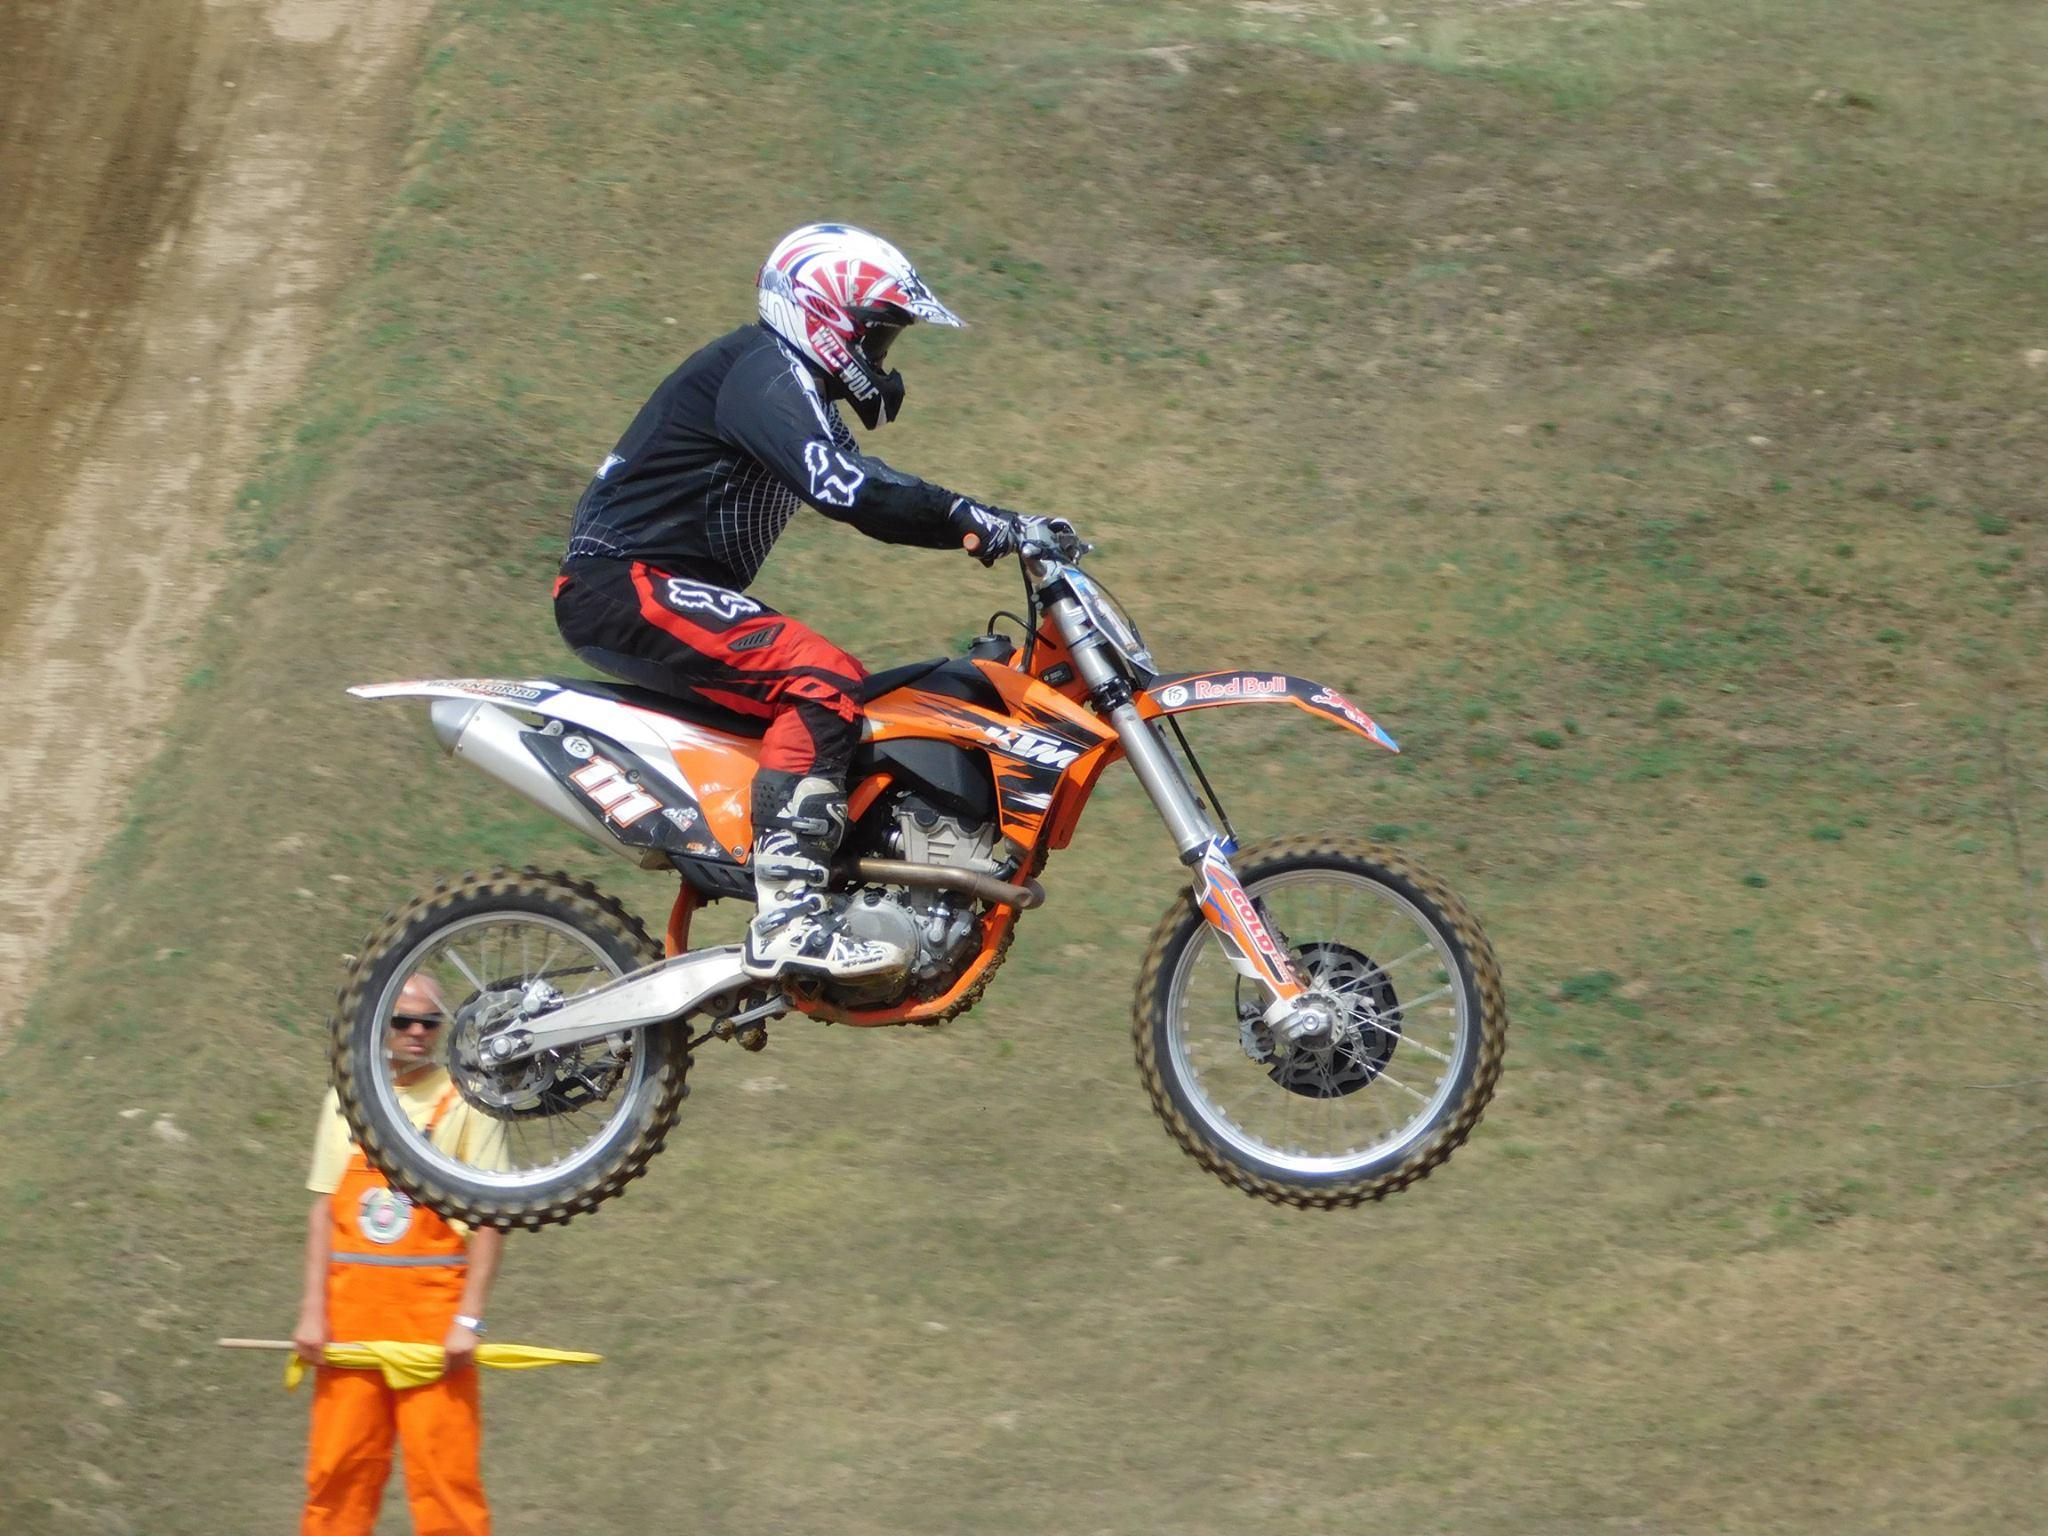 motocross rider romania